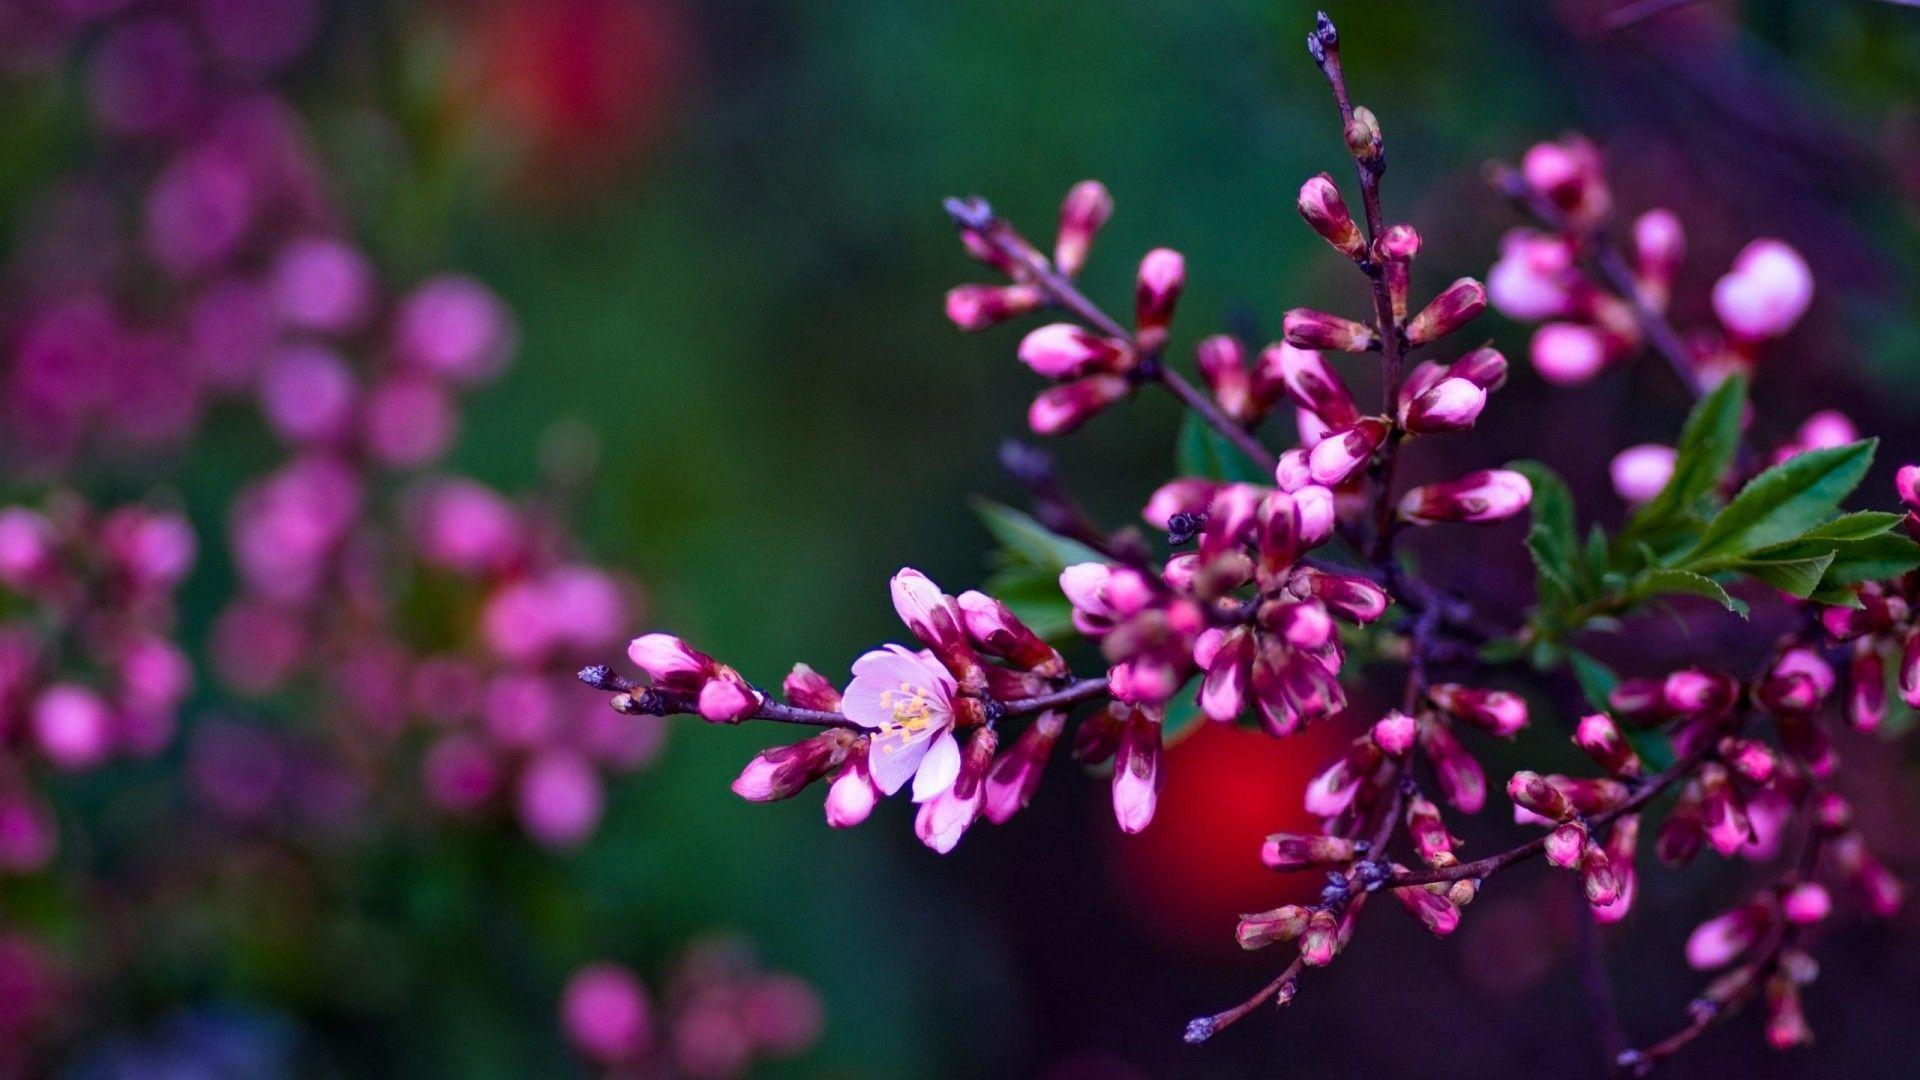 Hd wallpaper spring - Purple Spring Flower Hd Wallpaper Amazon Walls